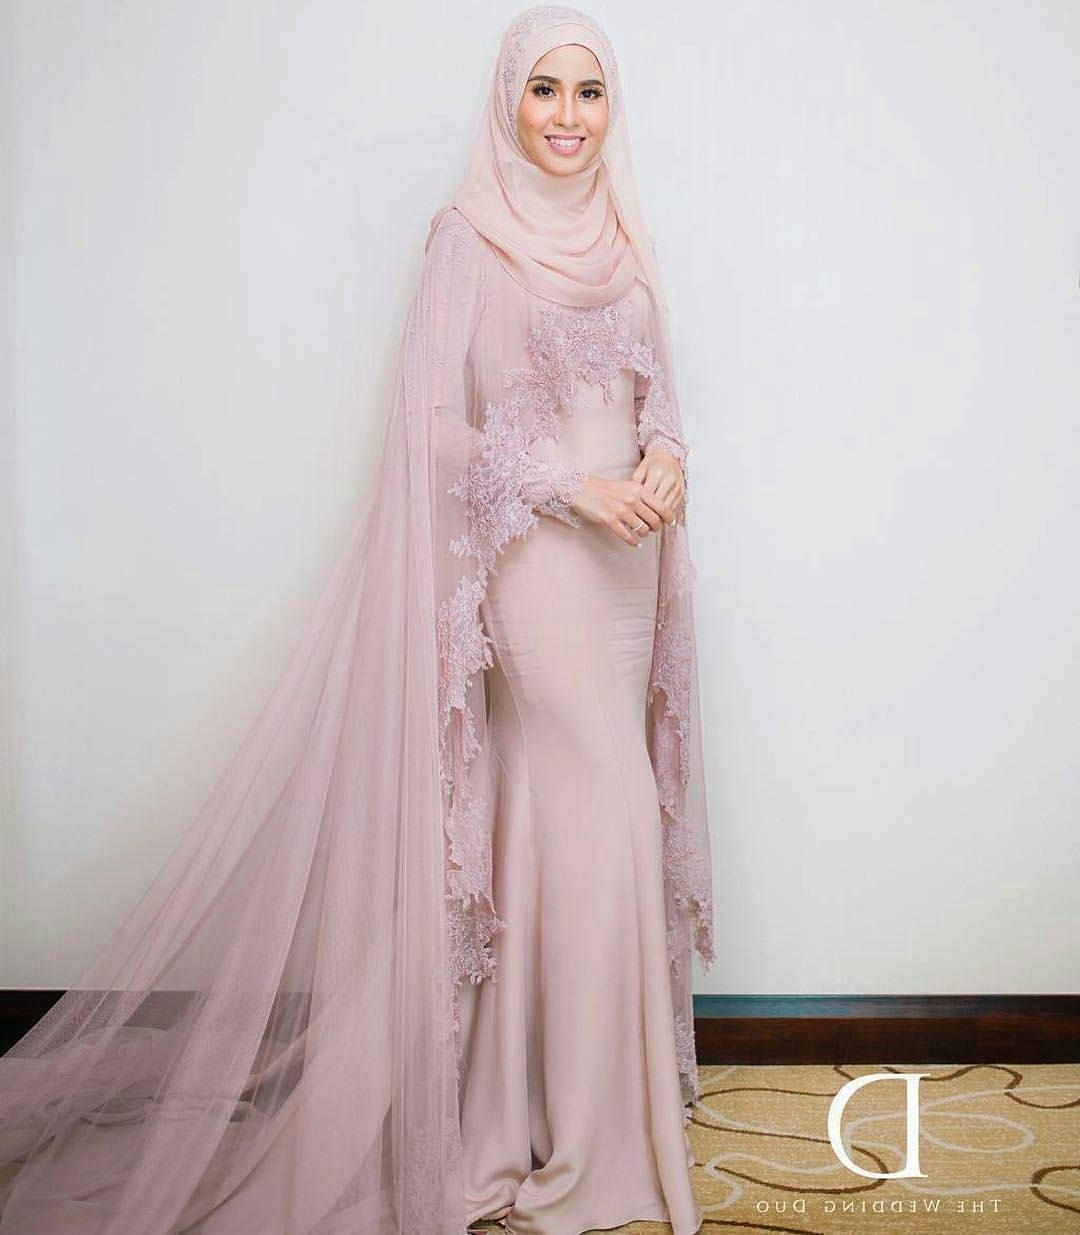 Bentuk Gaun Pernikahan Muslimah Elegan Fmdf Pin by Najibah Hasan On Party Hijab Dress